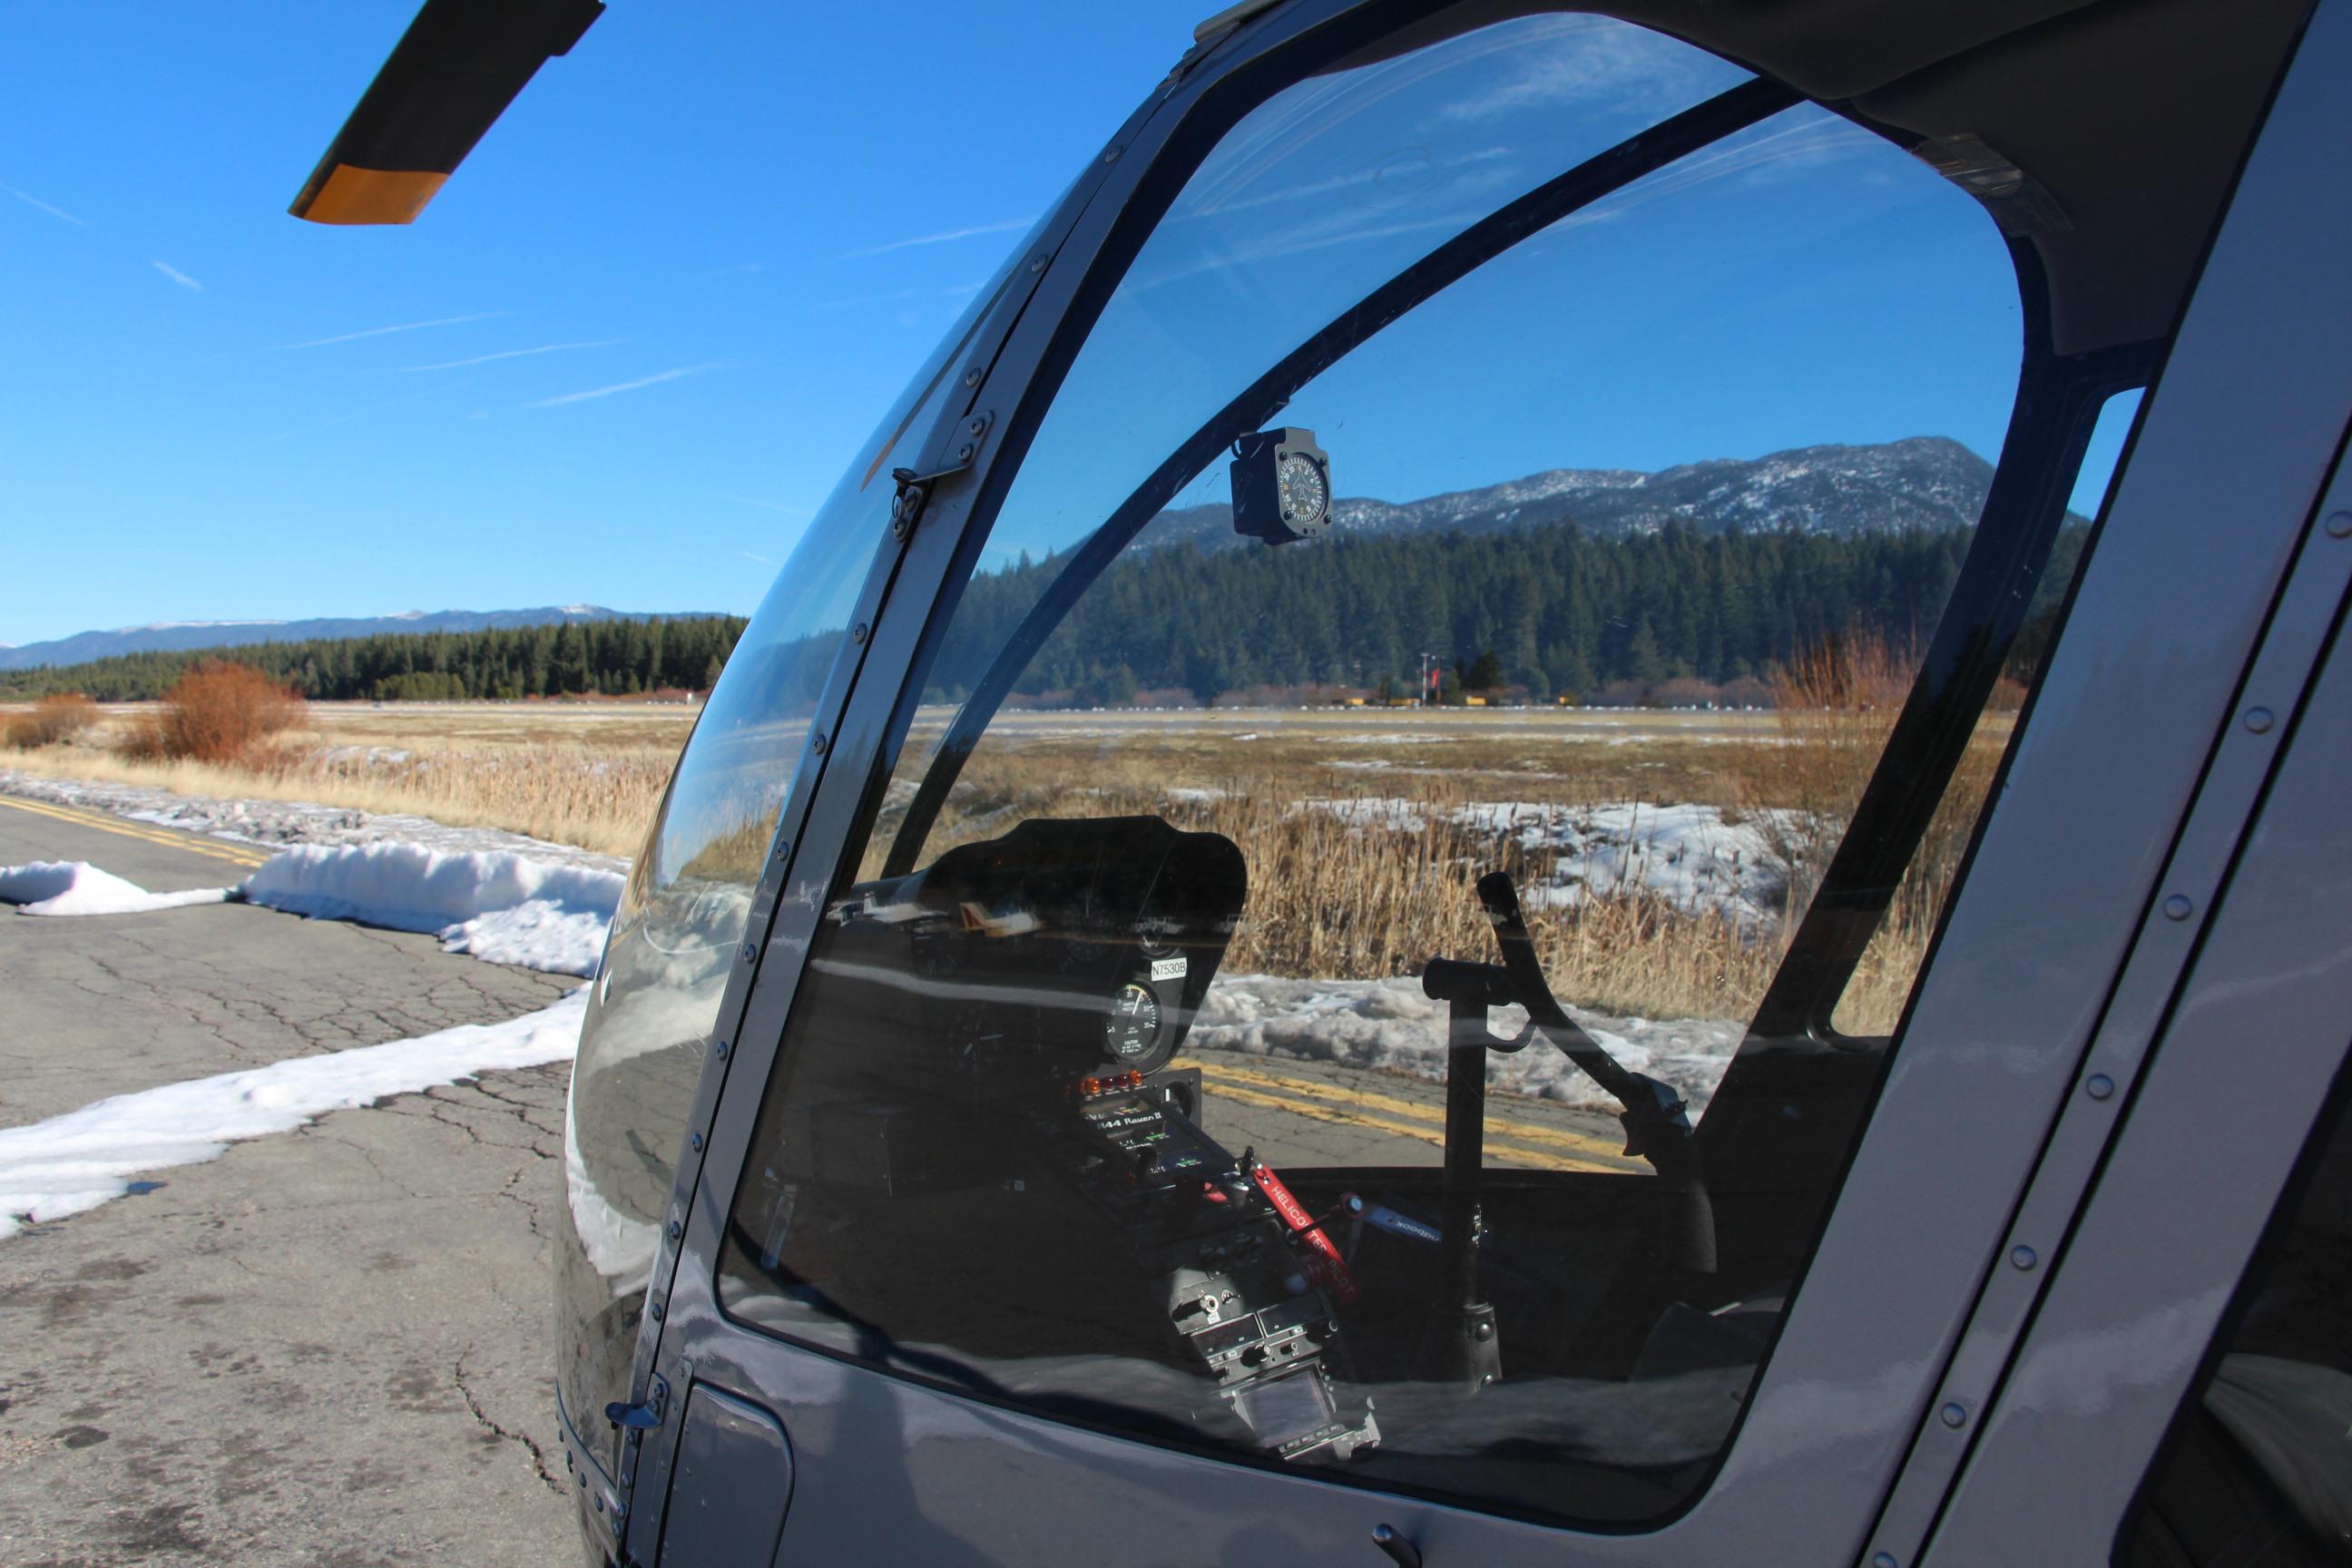 Reno Tahoe Helicopters_Lake Tahoe Airport